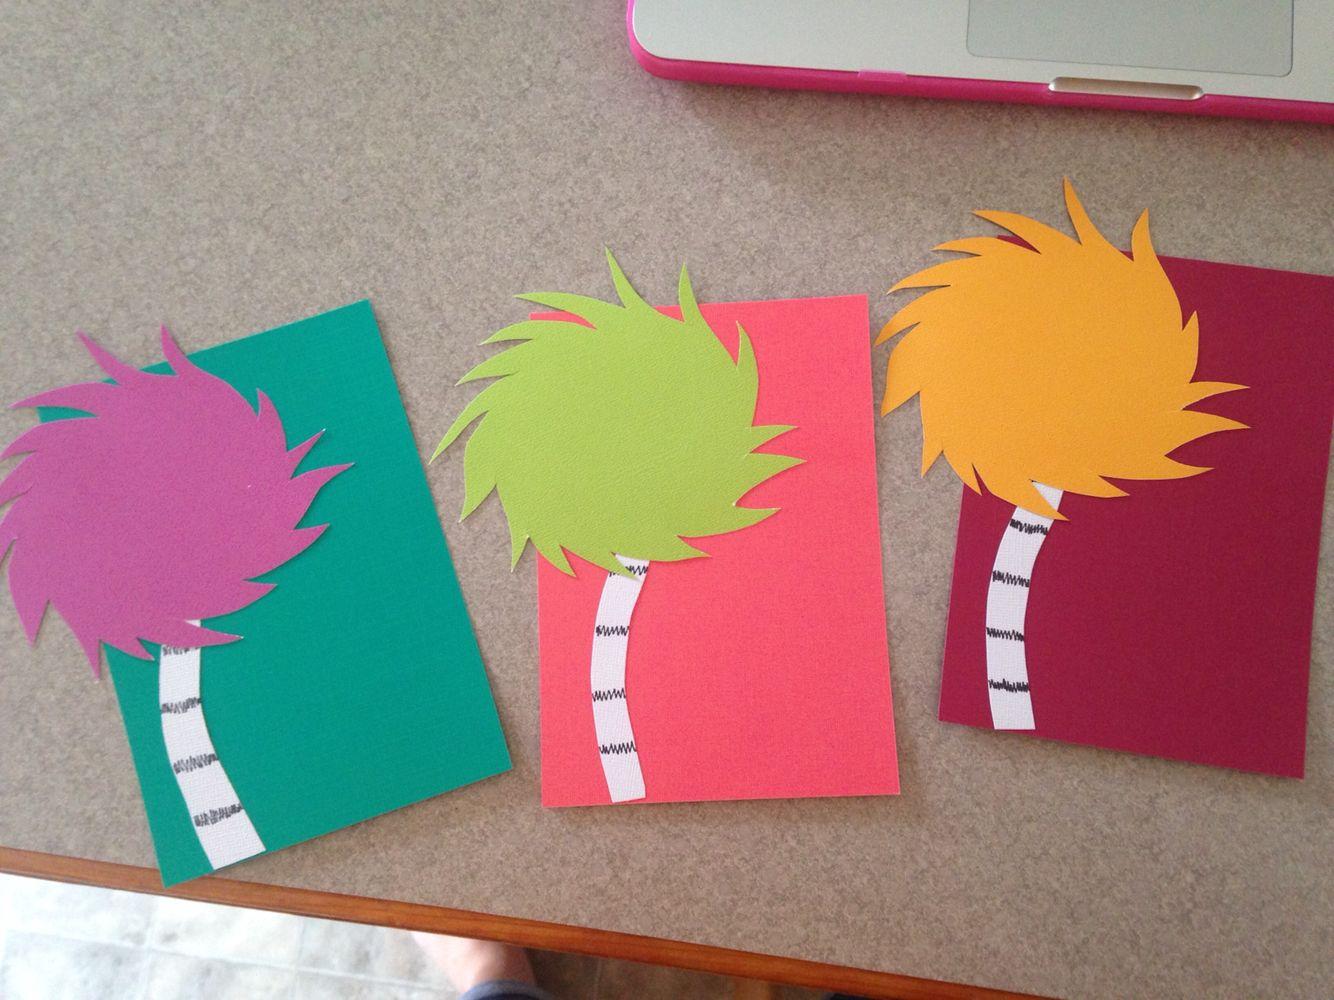 Truffula tree door decs & Truffula tree door decs | Dr. Seuss Theme | Pinterest | Door decs ... pezcame.com